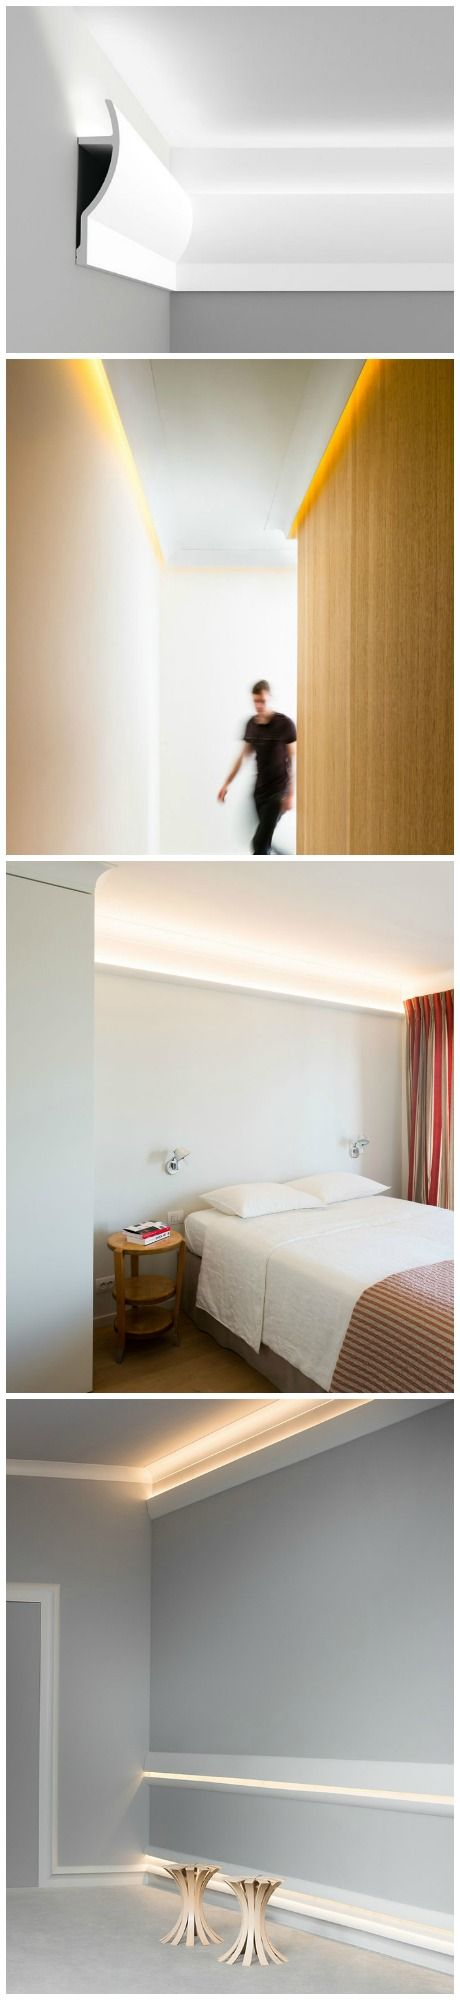 DIY Crown Molding for Indirect Lighting | Pinterest | Indirect ...